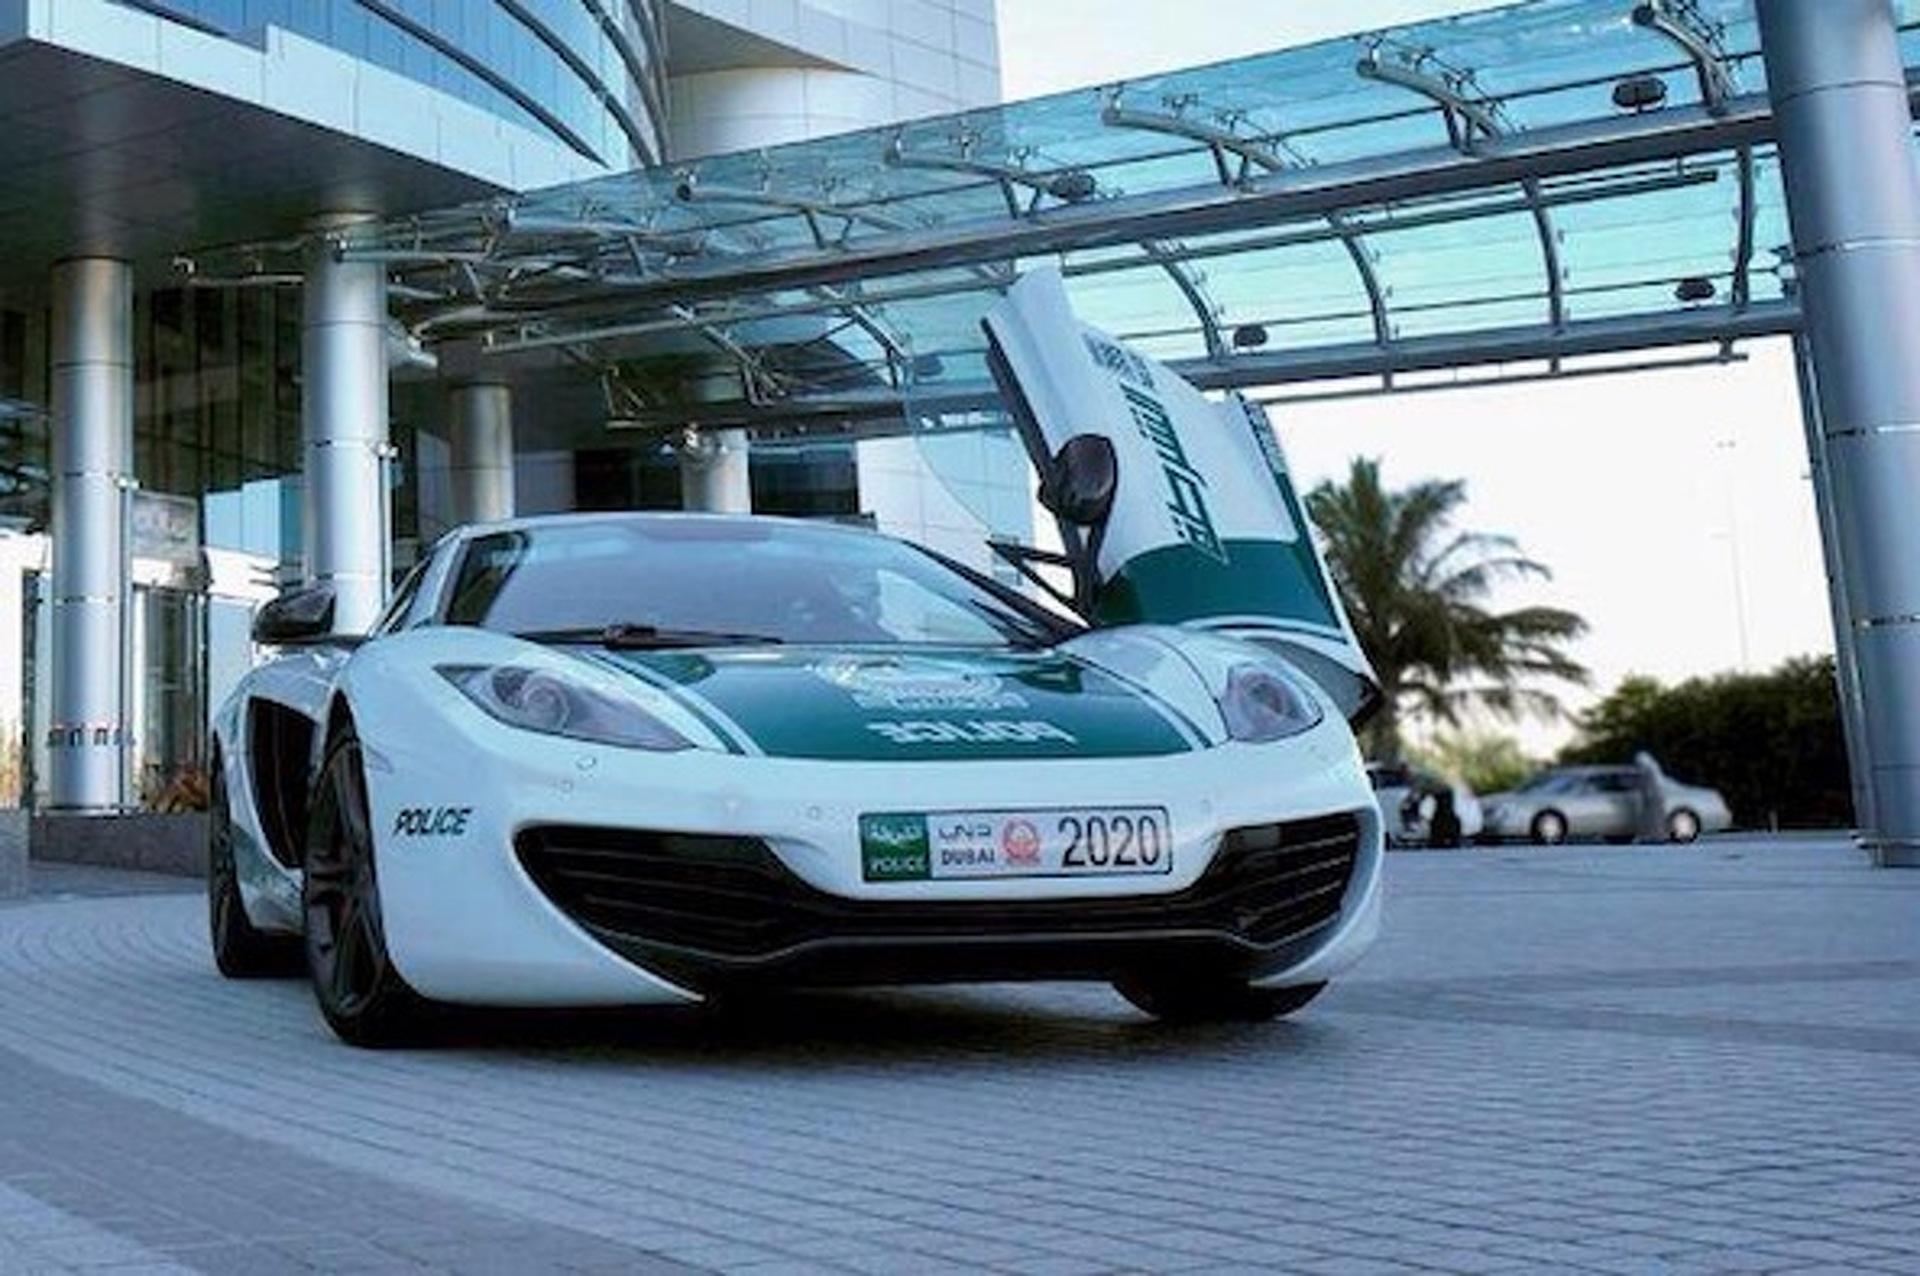 Dubai PD Adds McLaren MP4-12C to its Growing Fleet of Supecars [w/video]